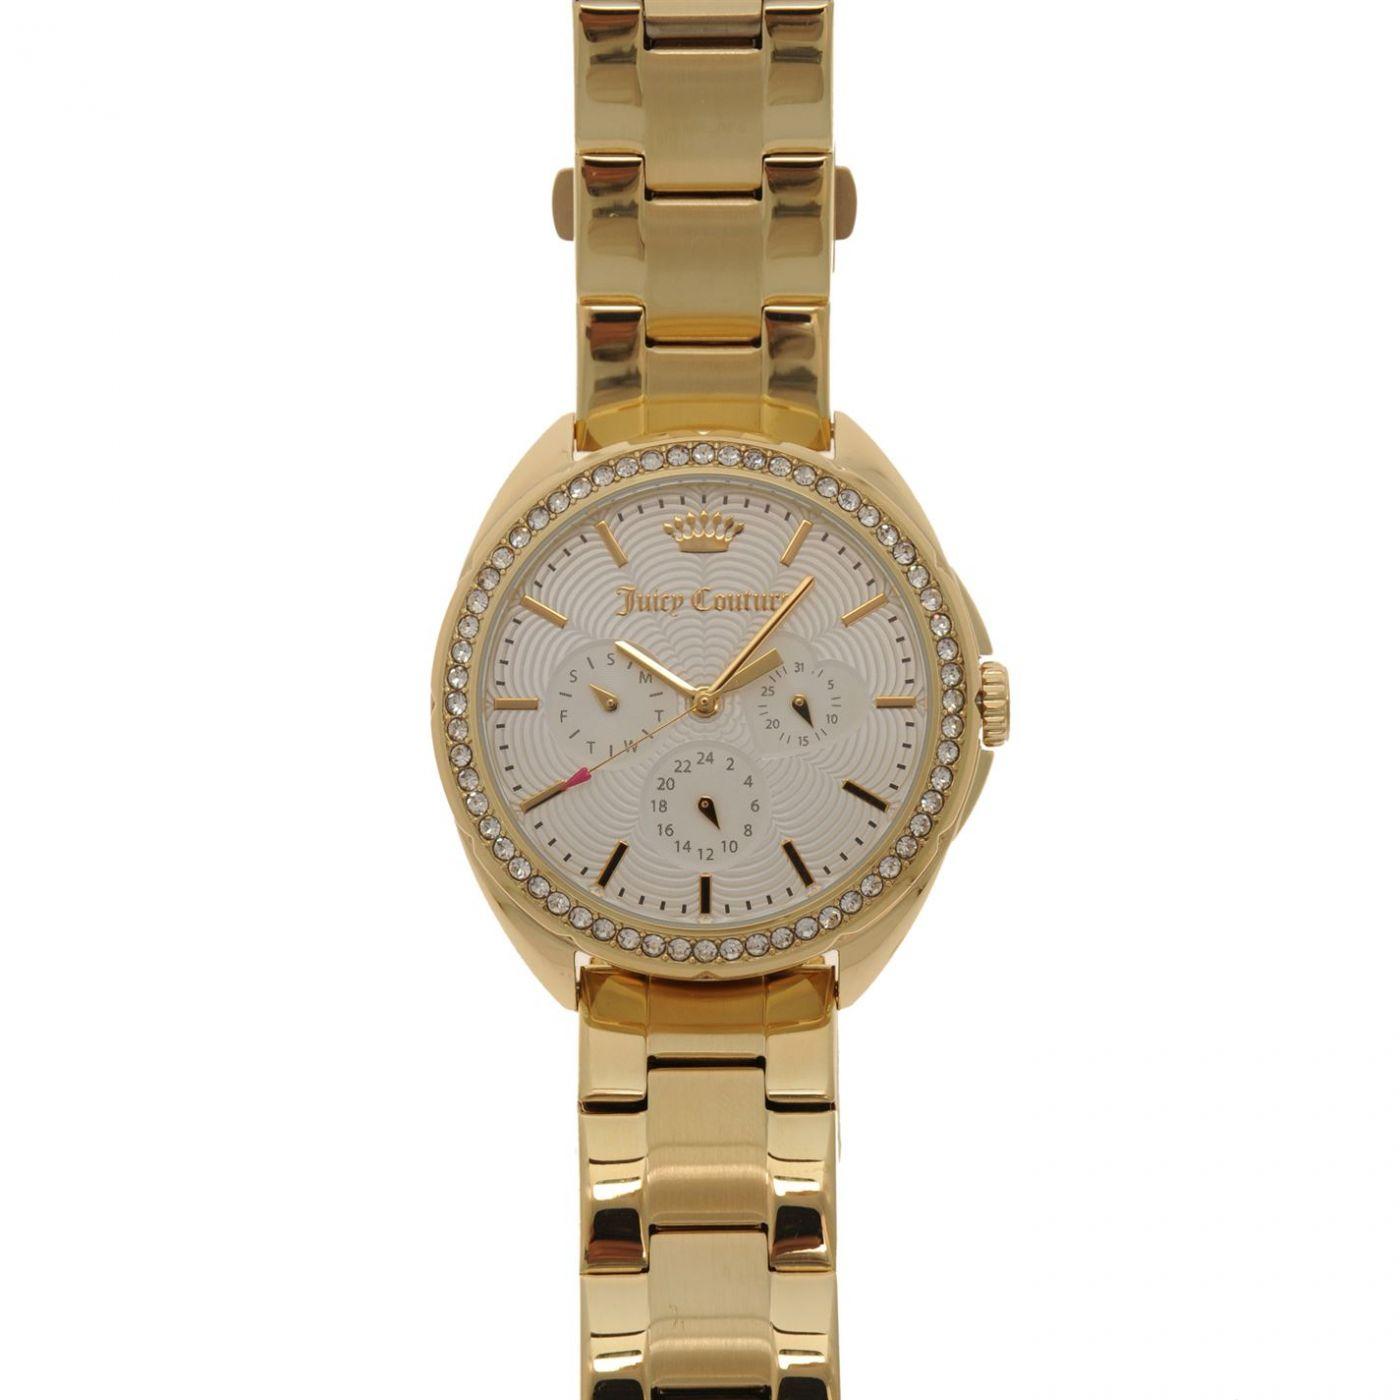 Juicy Couture Capri Watch Ld84